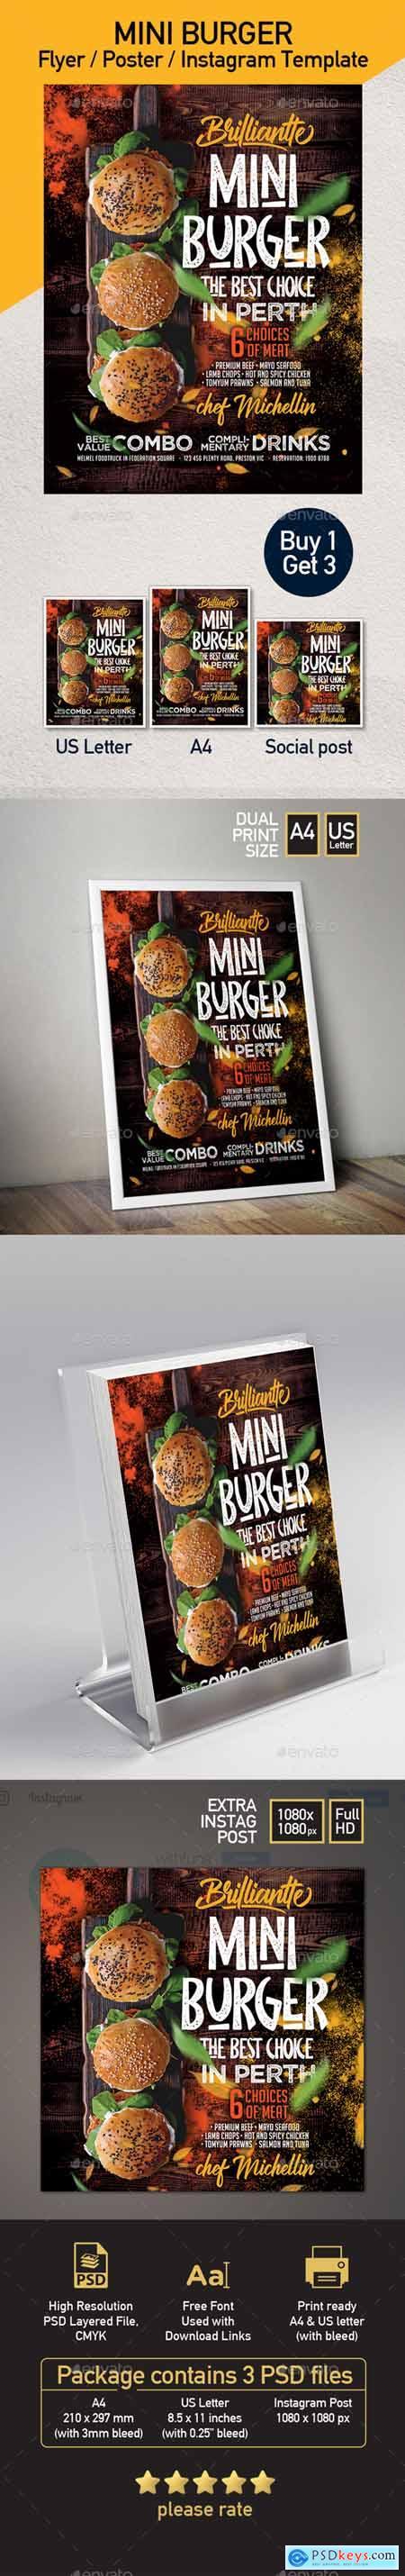 Burger Food Truck or Restaurant Menu Flyer - Set of 3 Templates 24088044